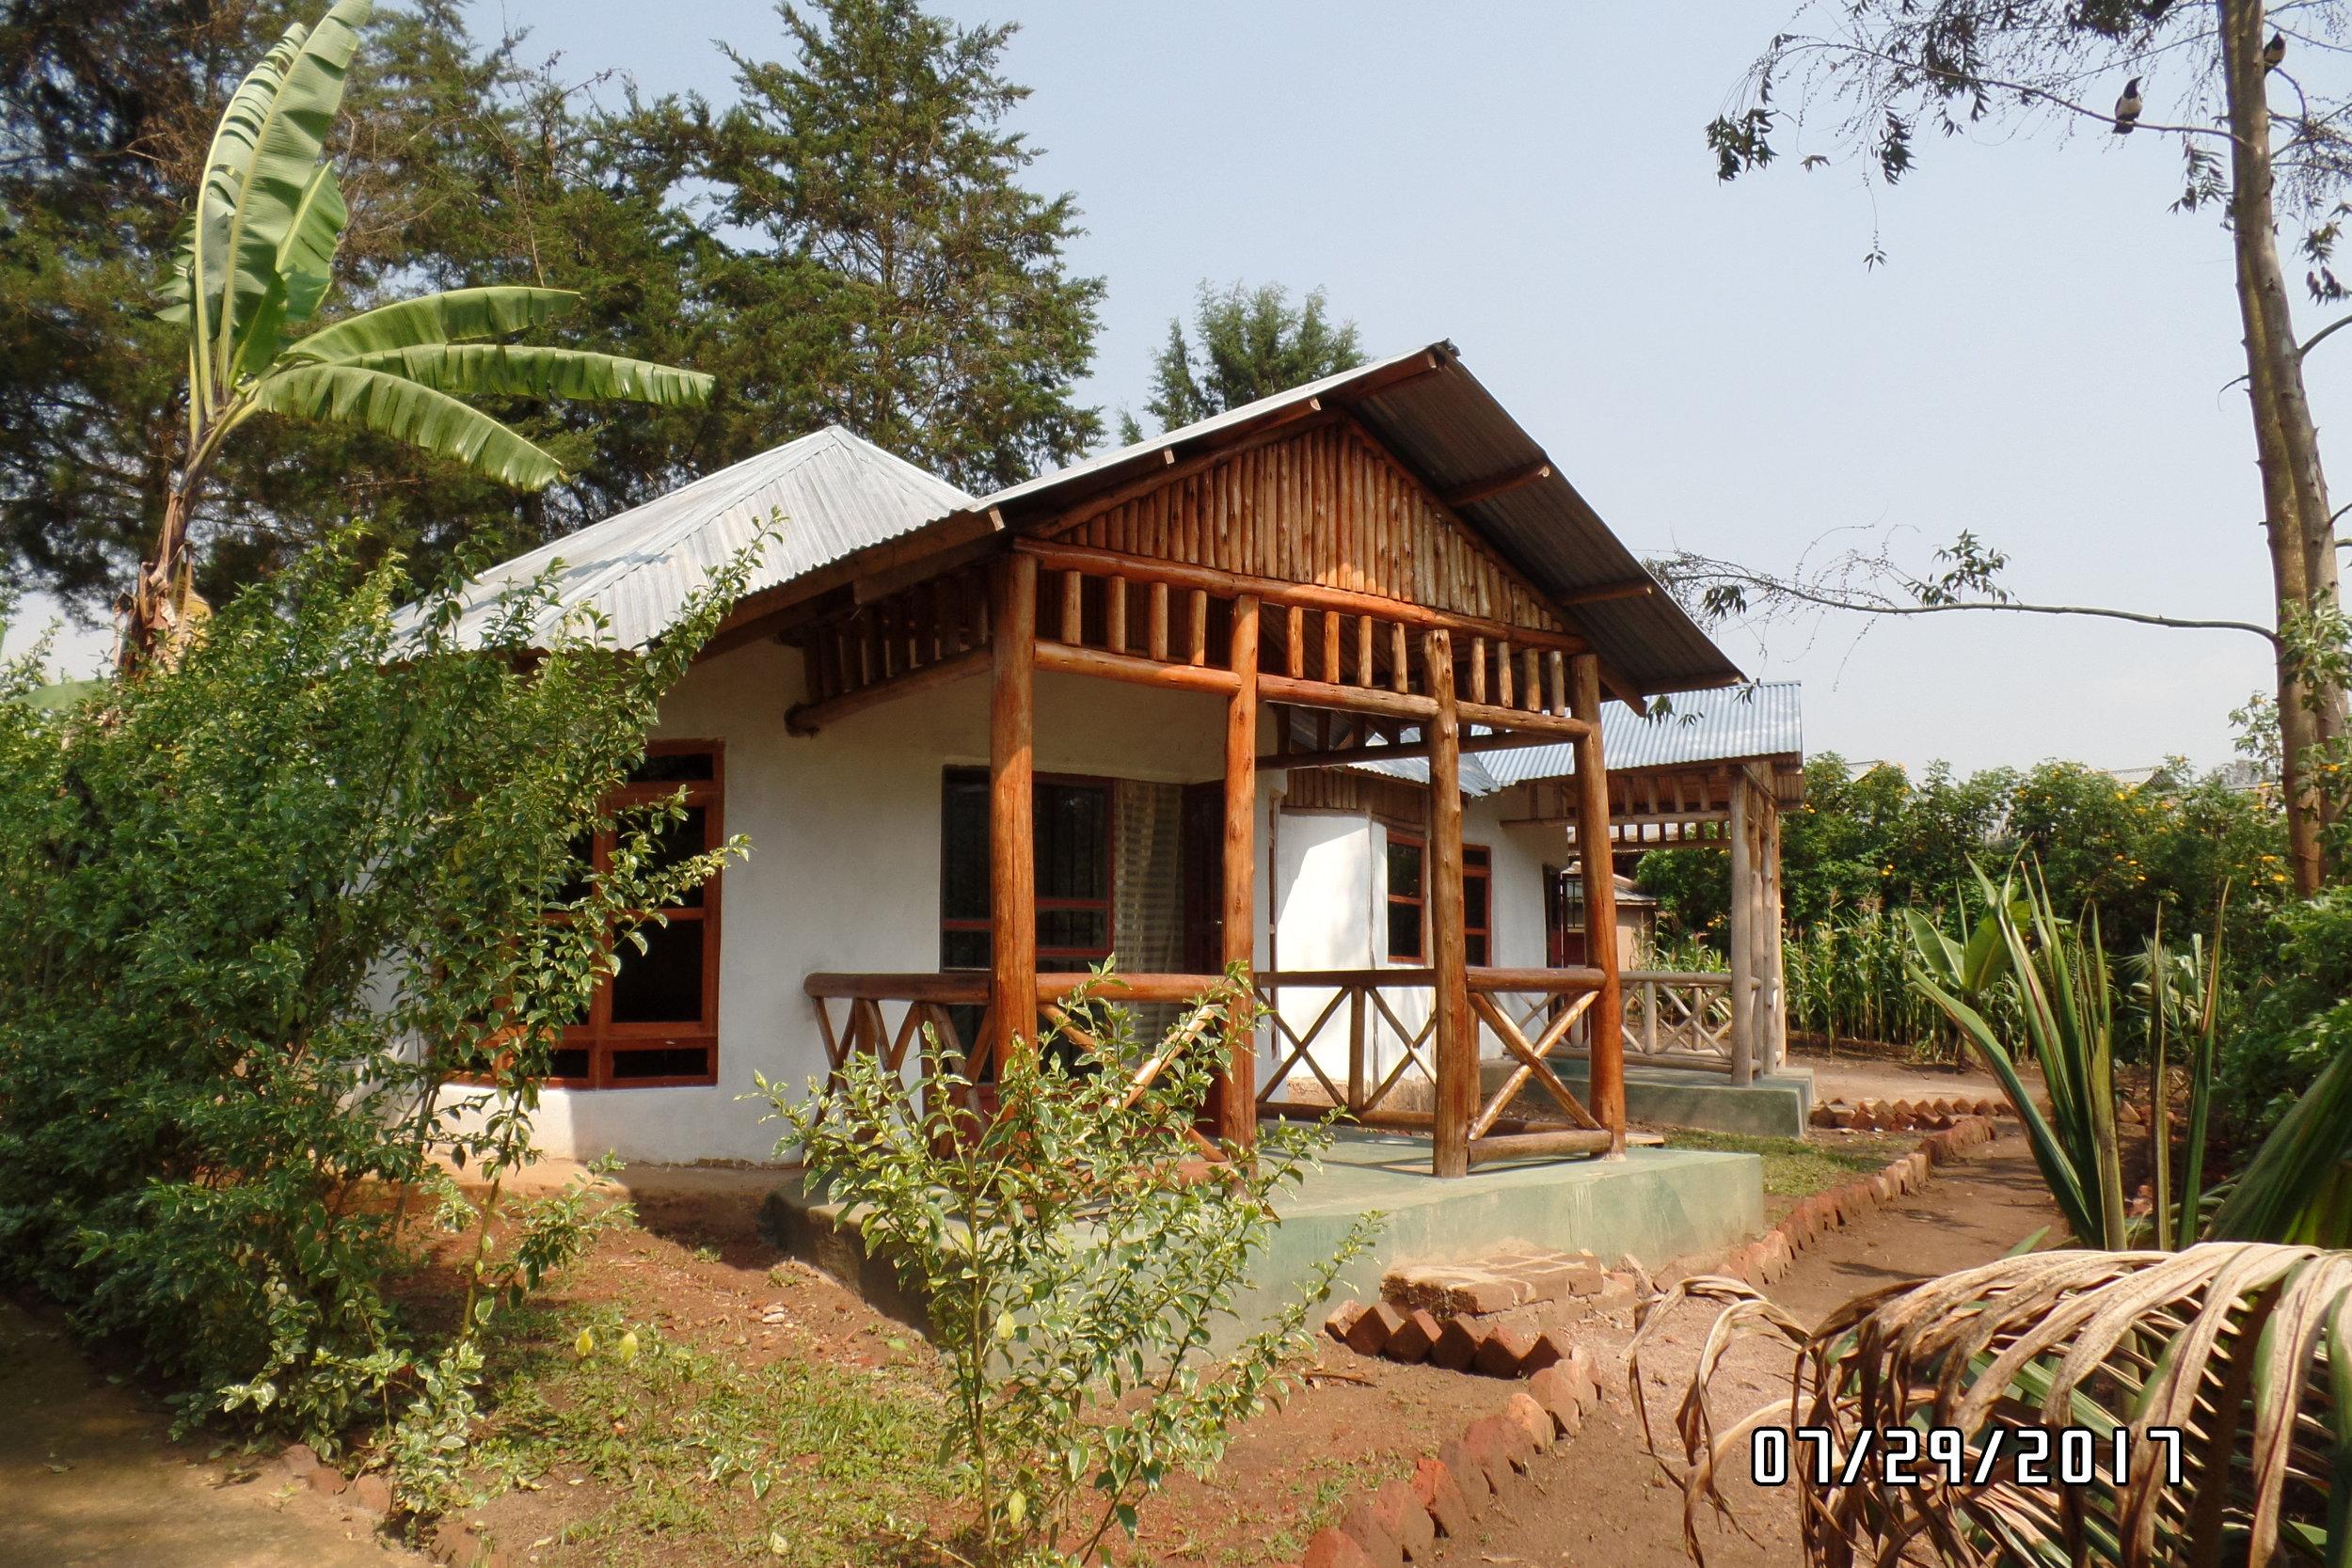 Gorilla Lodge in Rubuguri is where we set up camp.